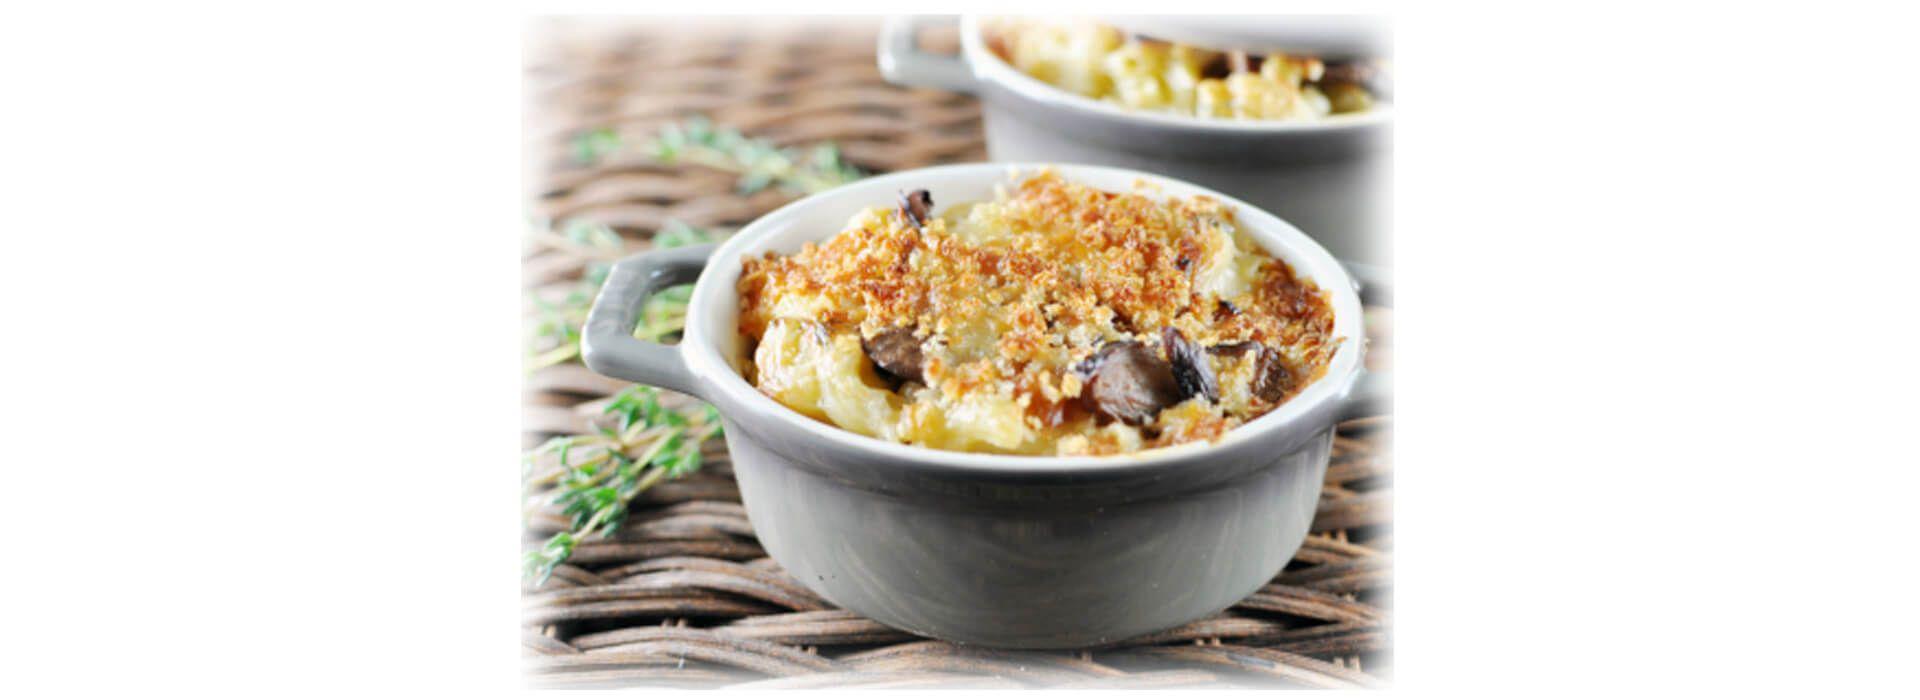 Wild Mushroom Mac And Cheese Recipe Mac Cheese Food Recipes